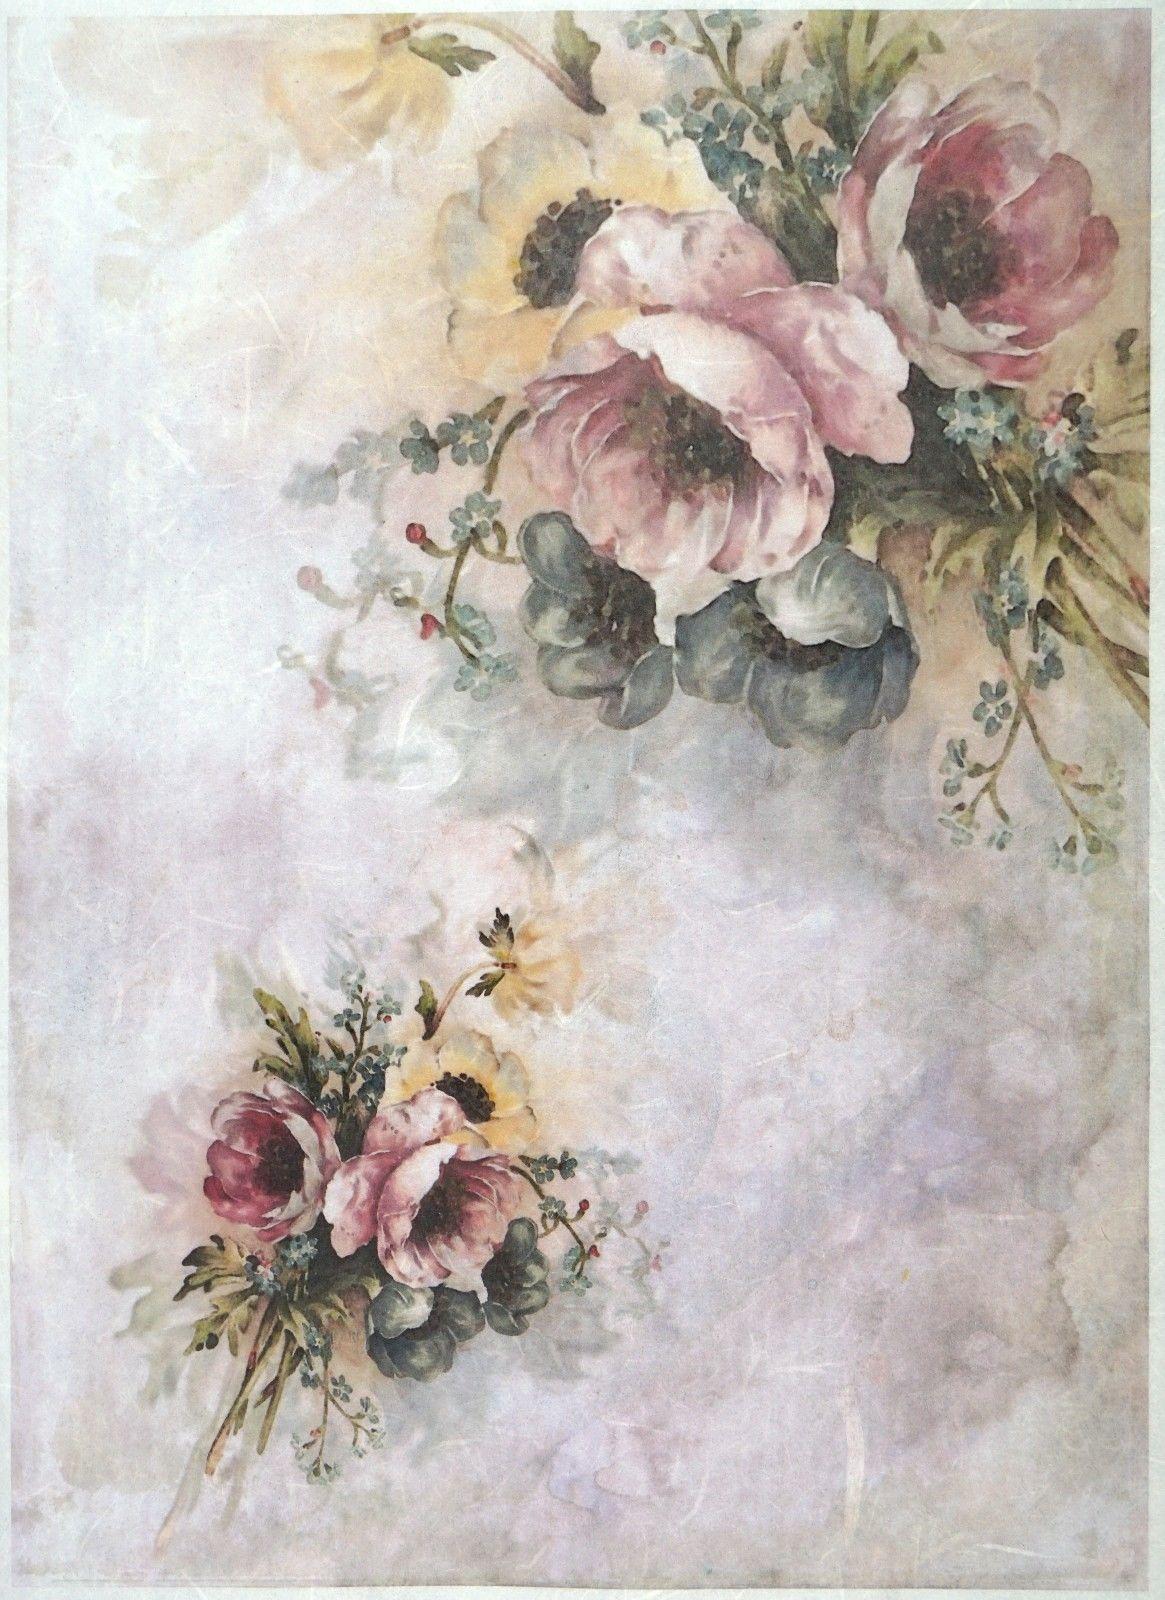 Rice Paper for Decoupage Decopatch Scrapbook Craft Sheet Vintage Garden of Love